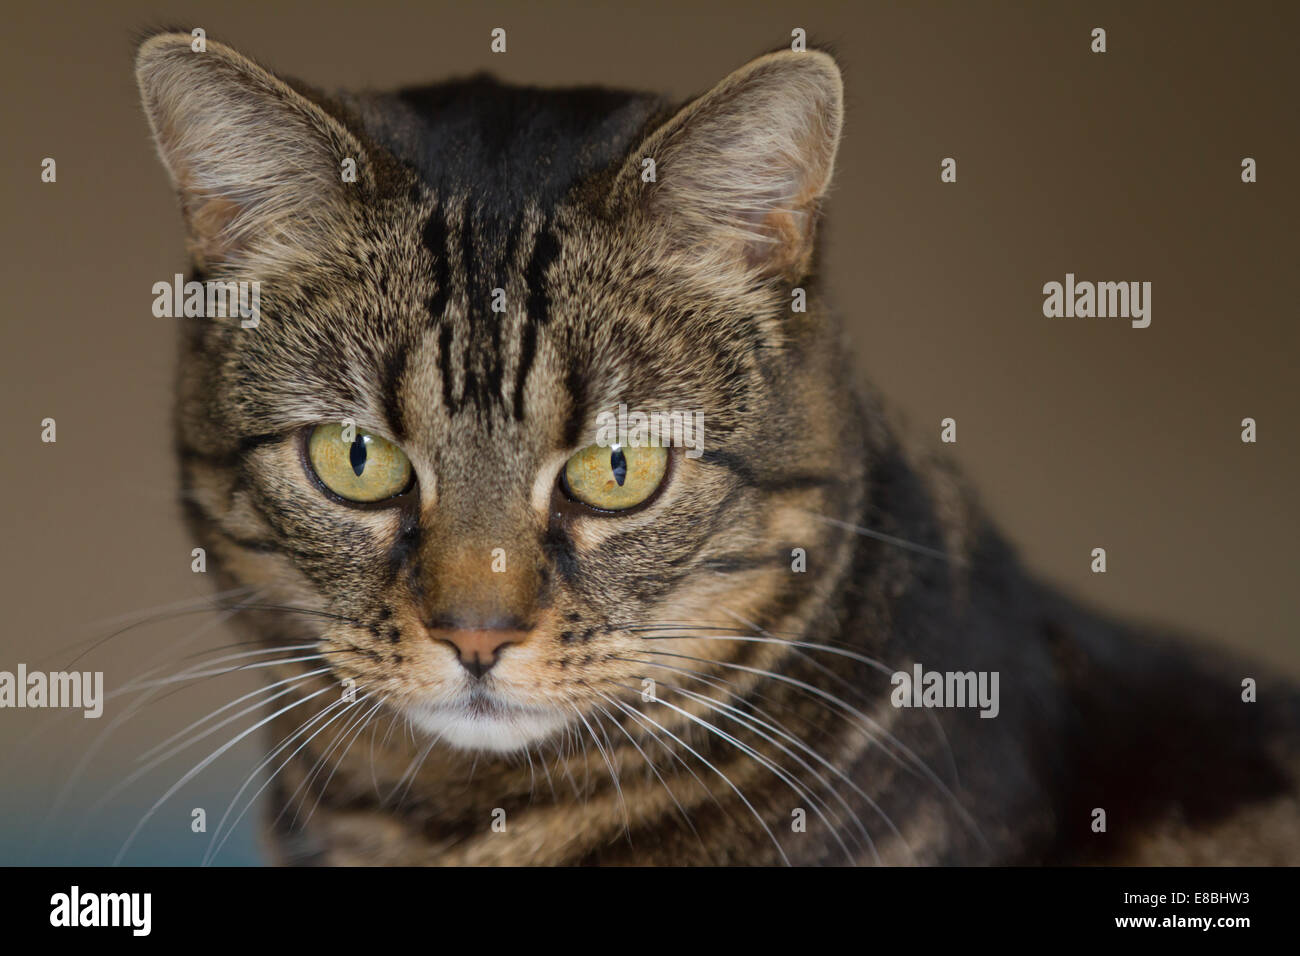 Common mackerel tabby cat sitting indoors in natural light, looking alert - Stock Image